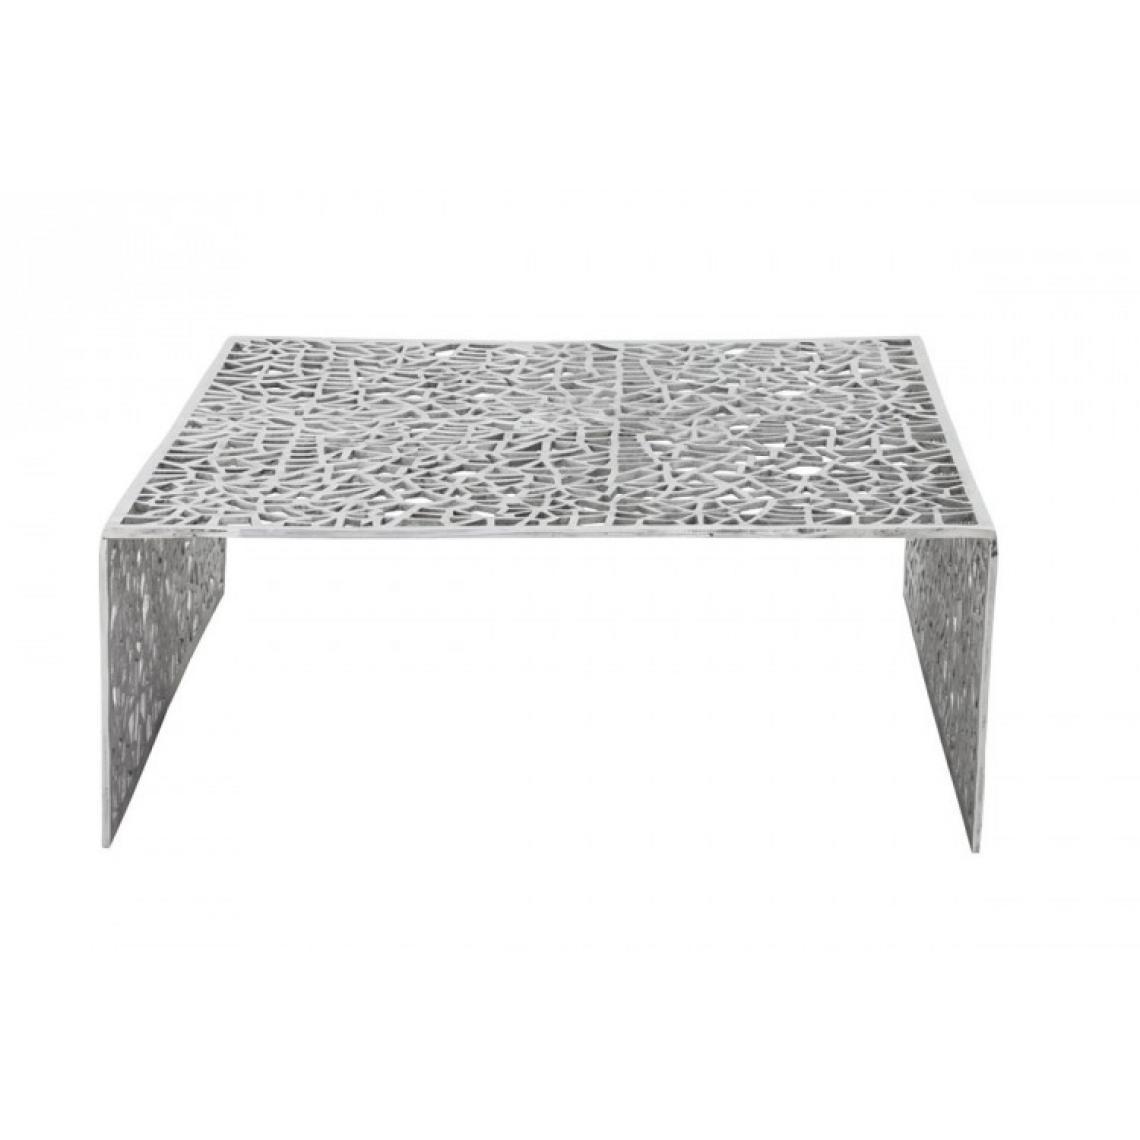 En Suisses Basse Table Alveoles3 Design Alu eCBdox